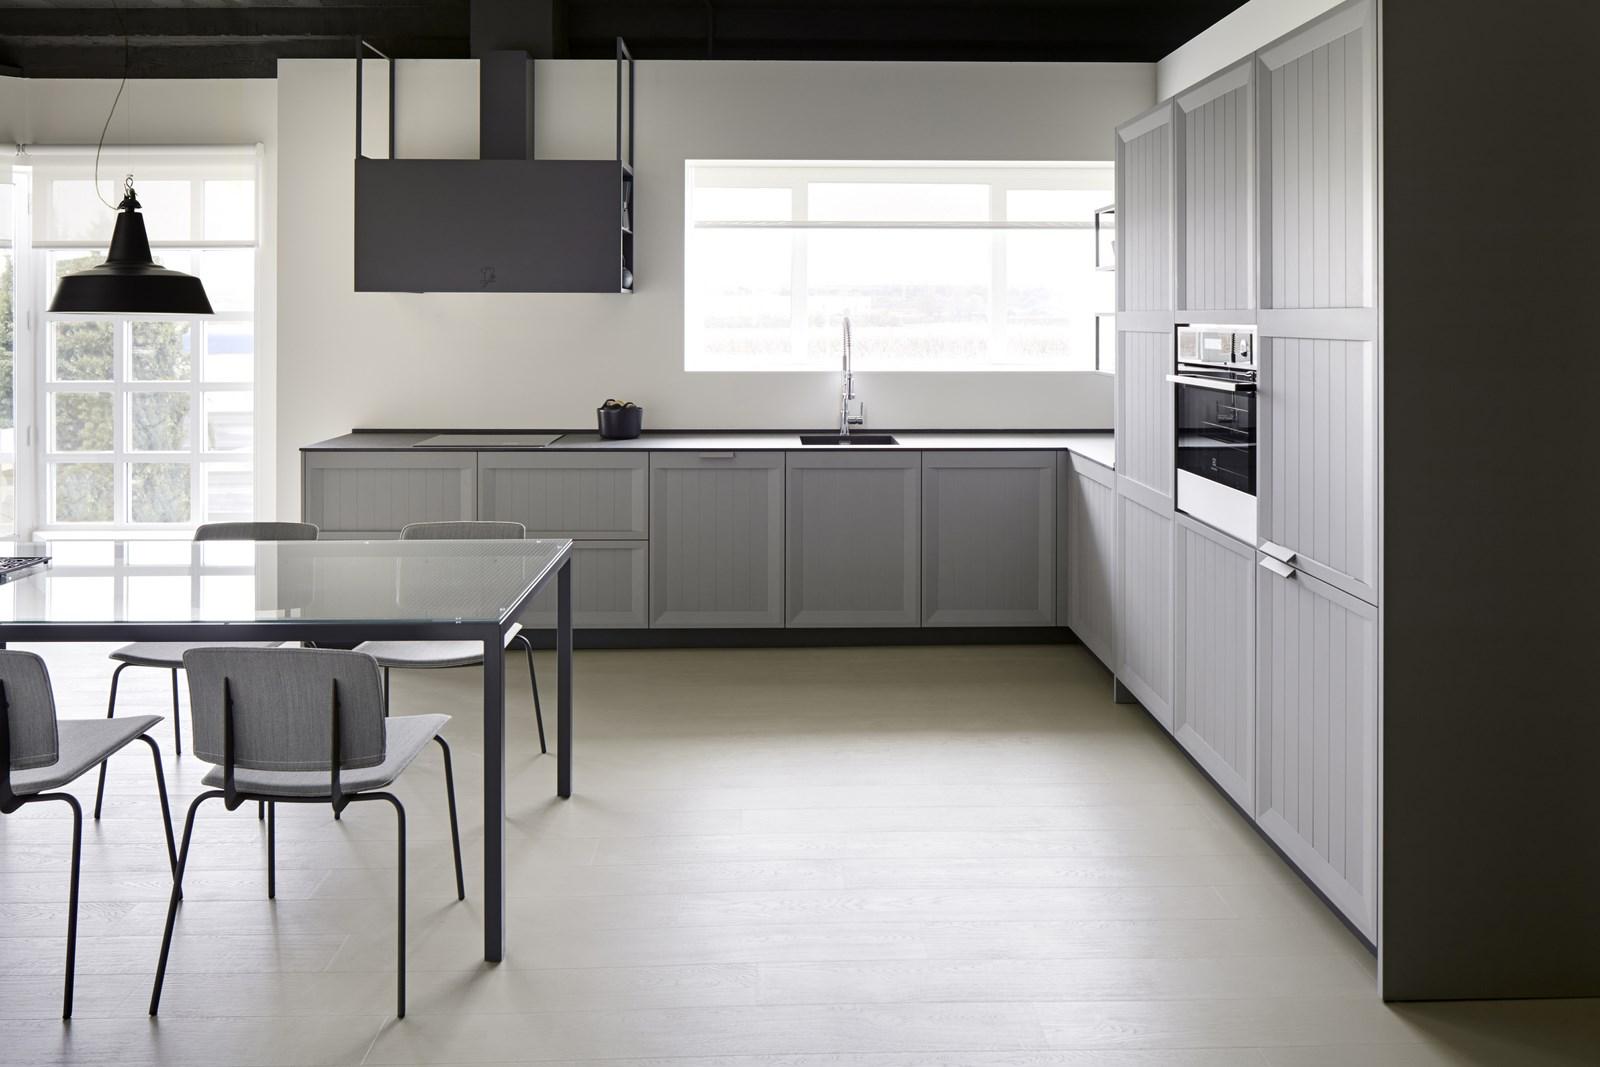 Muebles pulido decoracion e interiorismo madrid for Muebles industriales madrid